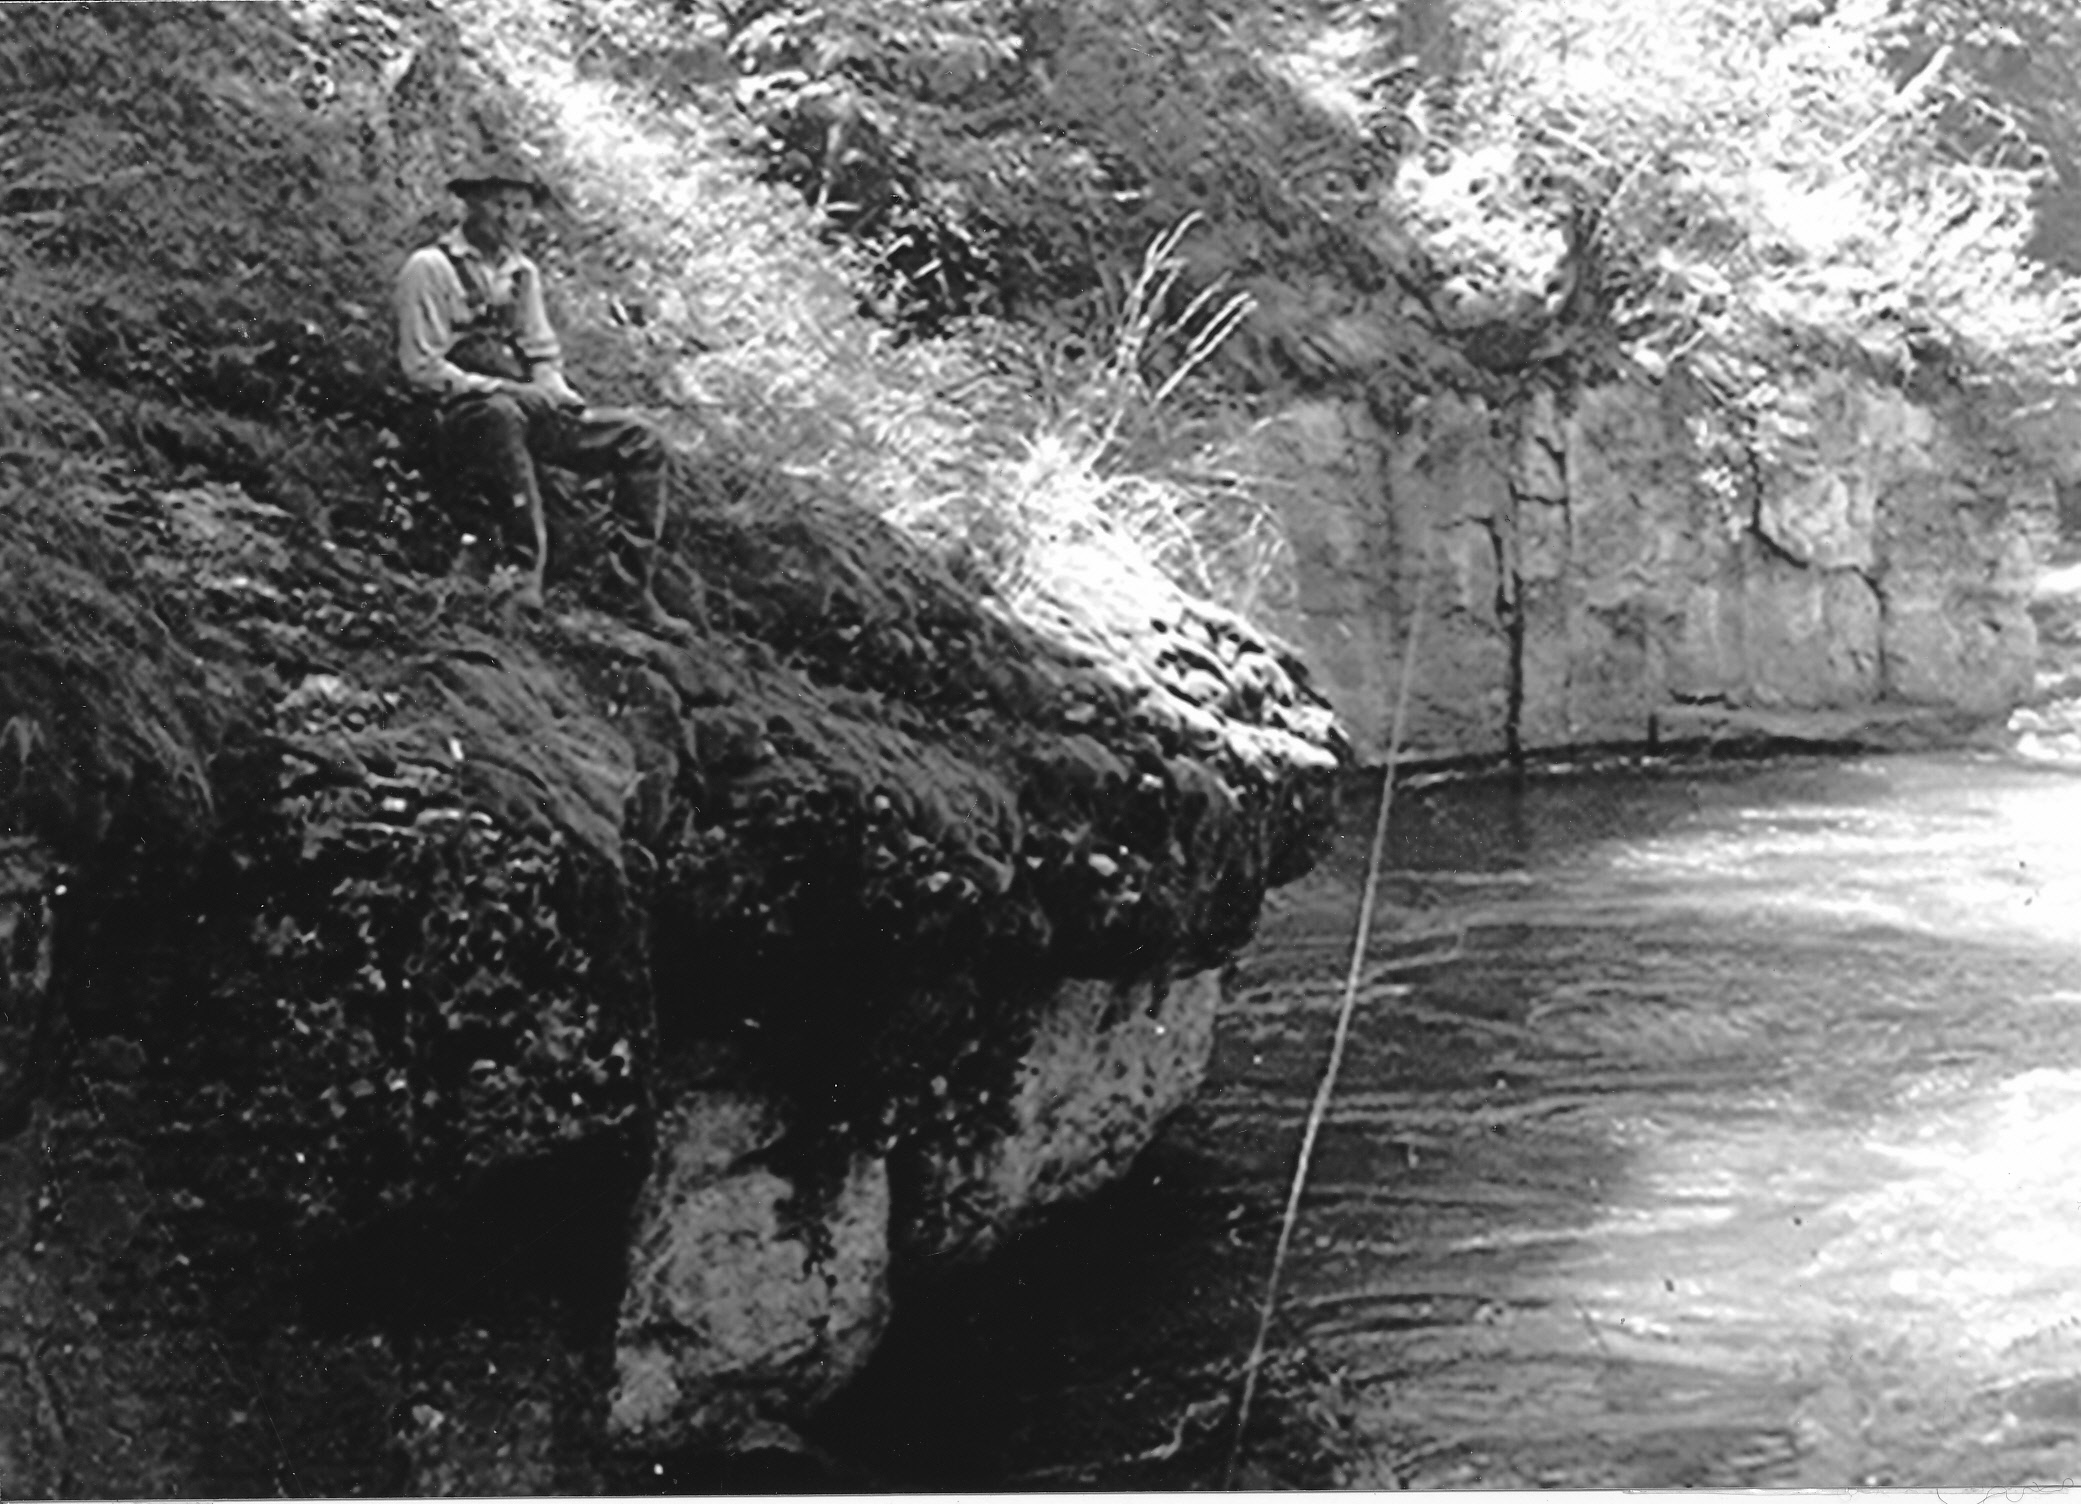 Joe Nelson fishing at The Ledges, 1940